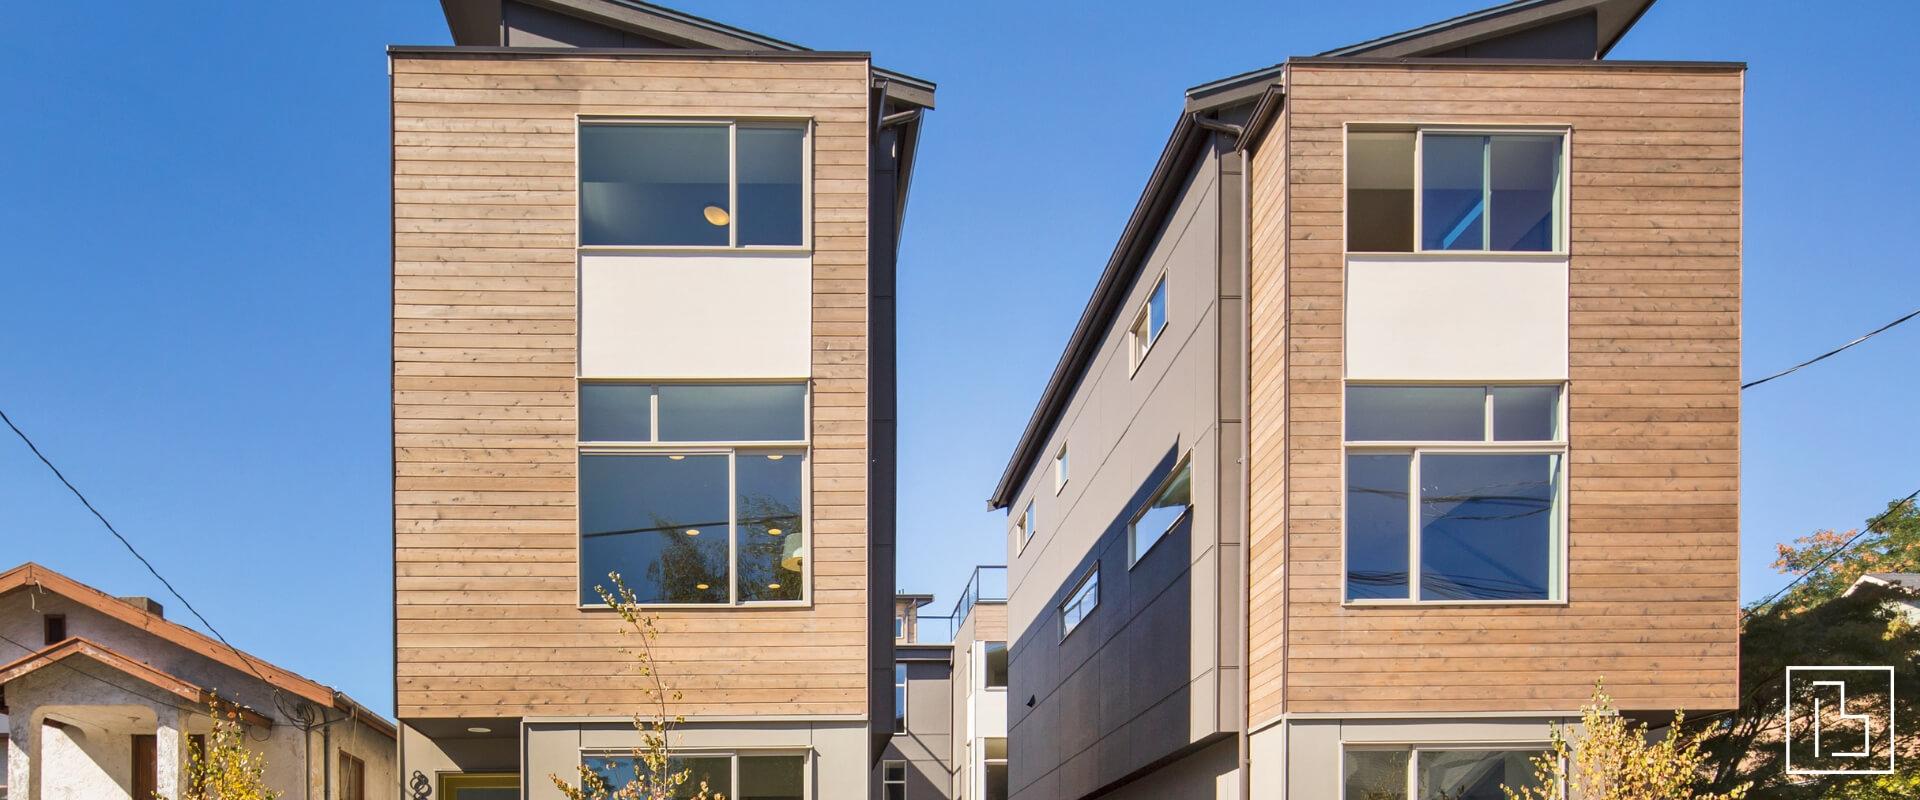 Two townhome exteriors - Beachworks LLC